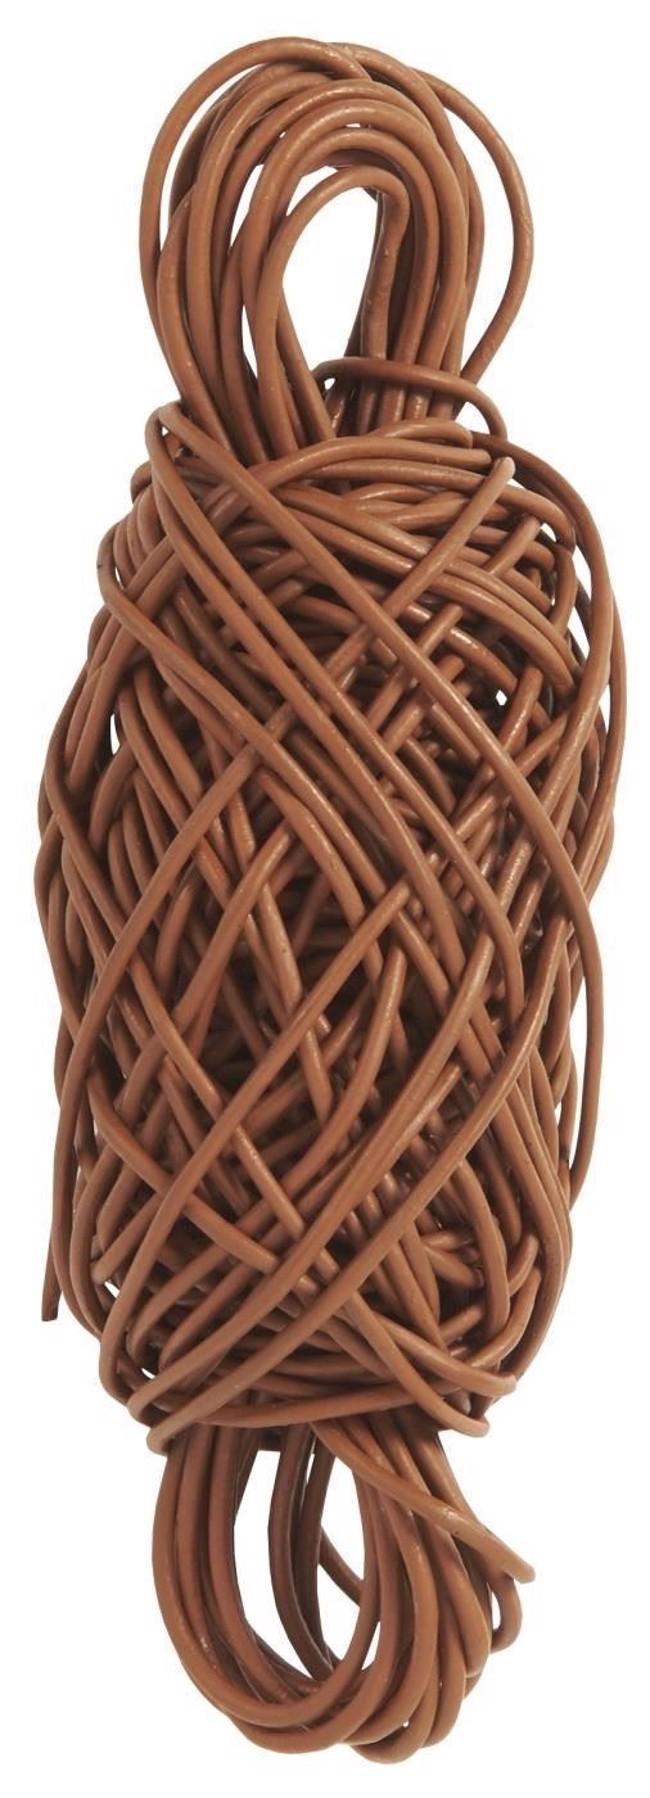 Image of   Lædersnor, rund, brun, 20m fra Ib Laursen